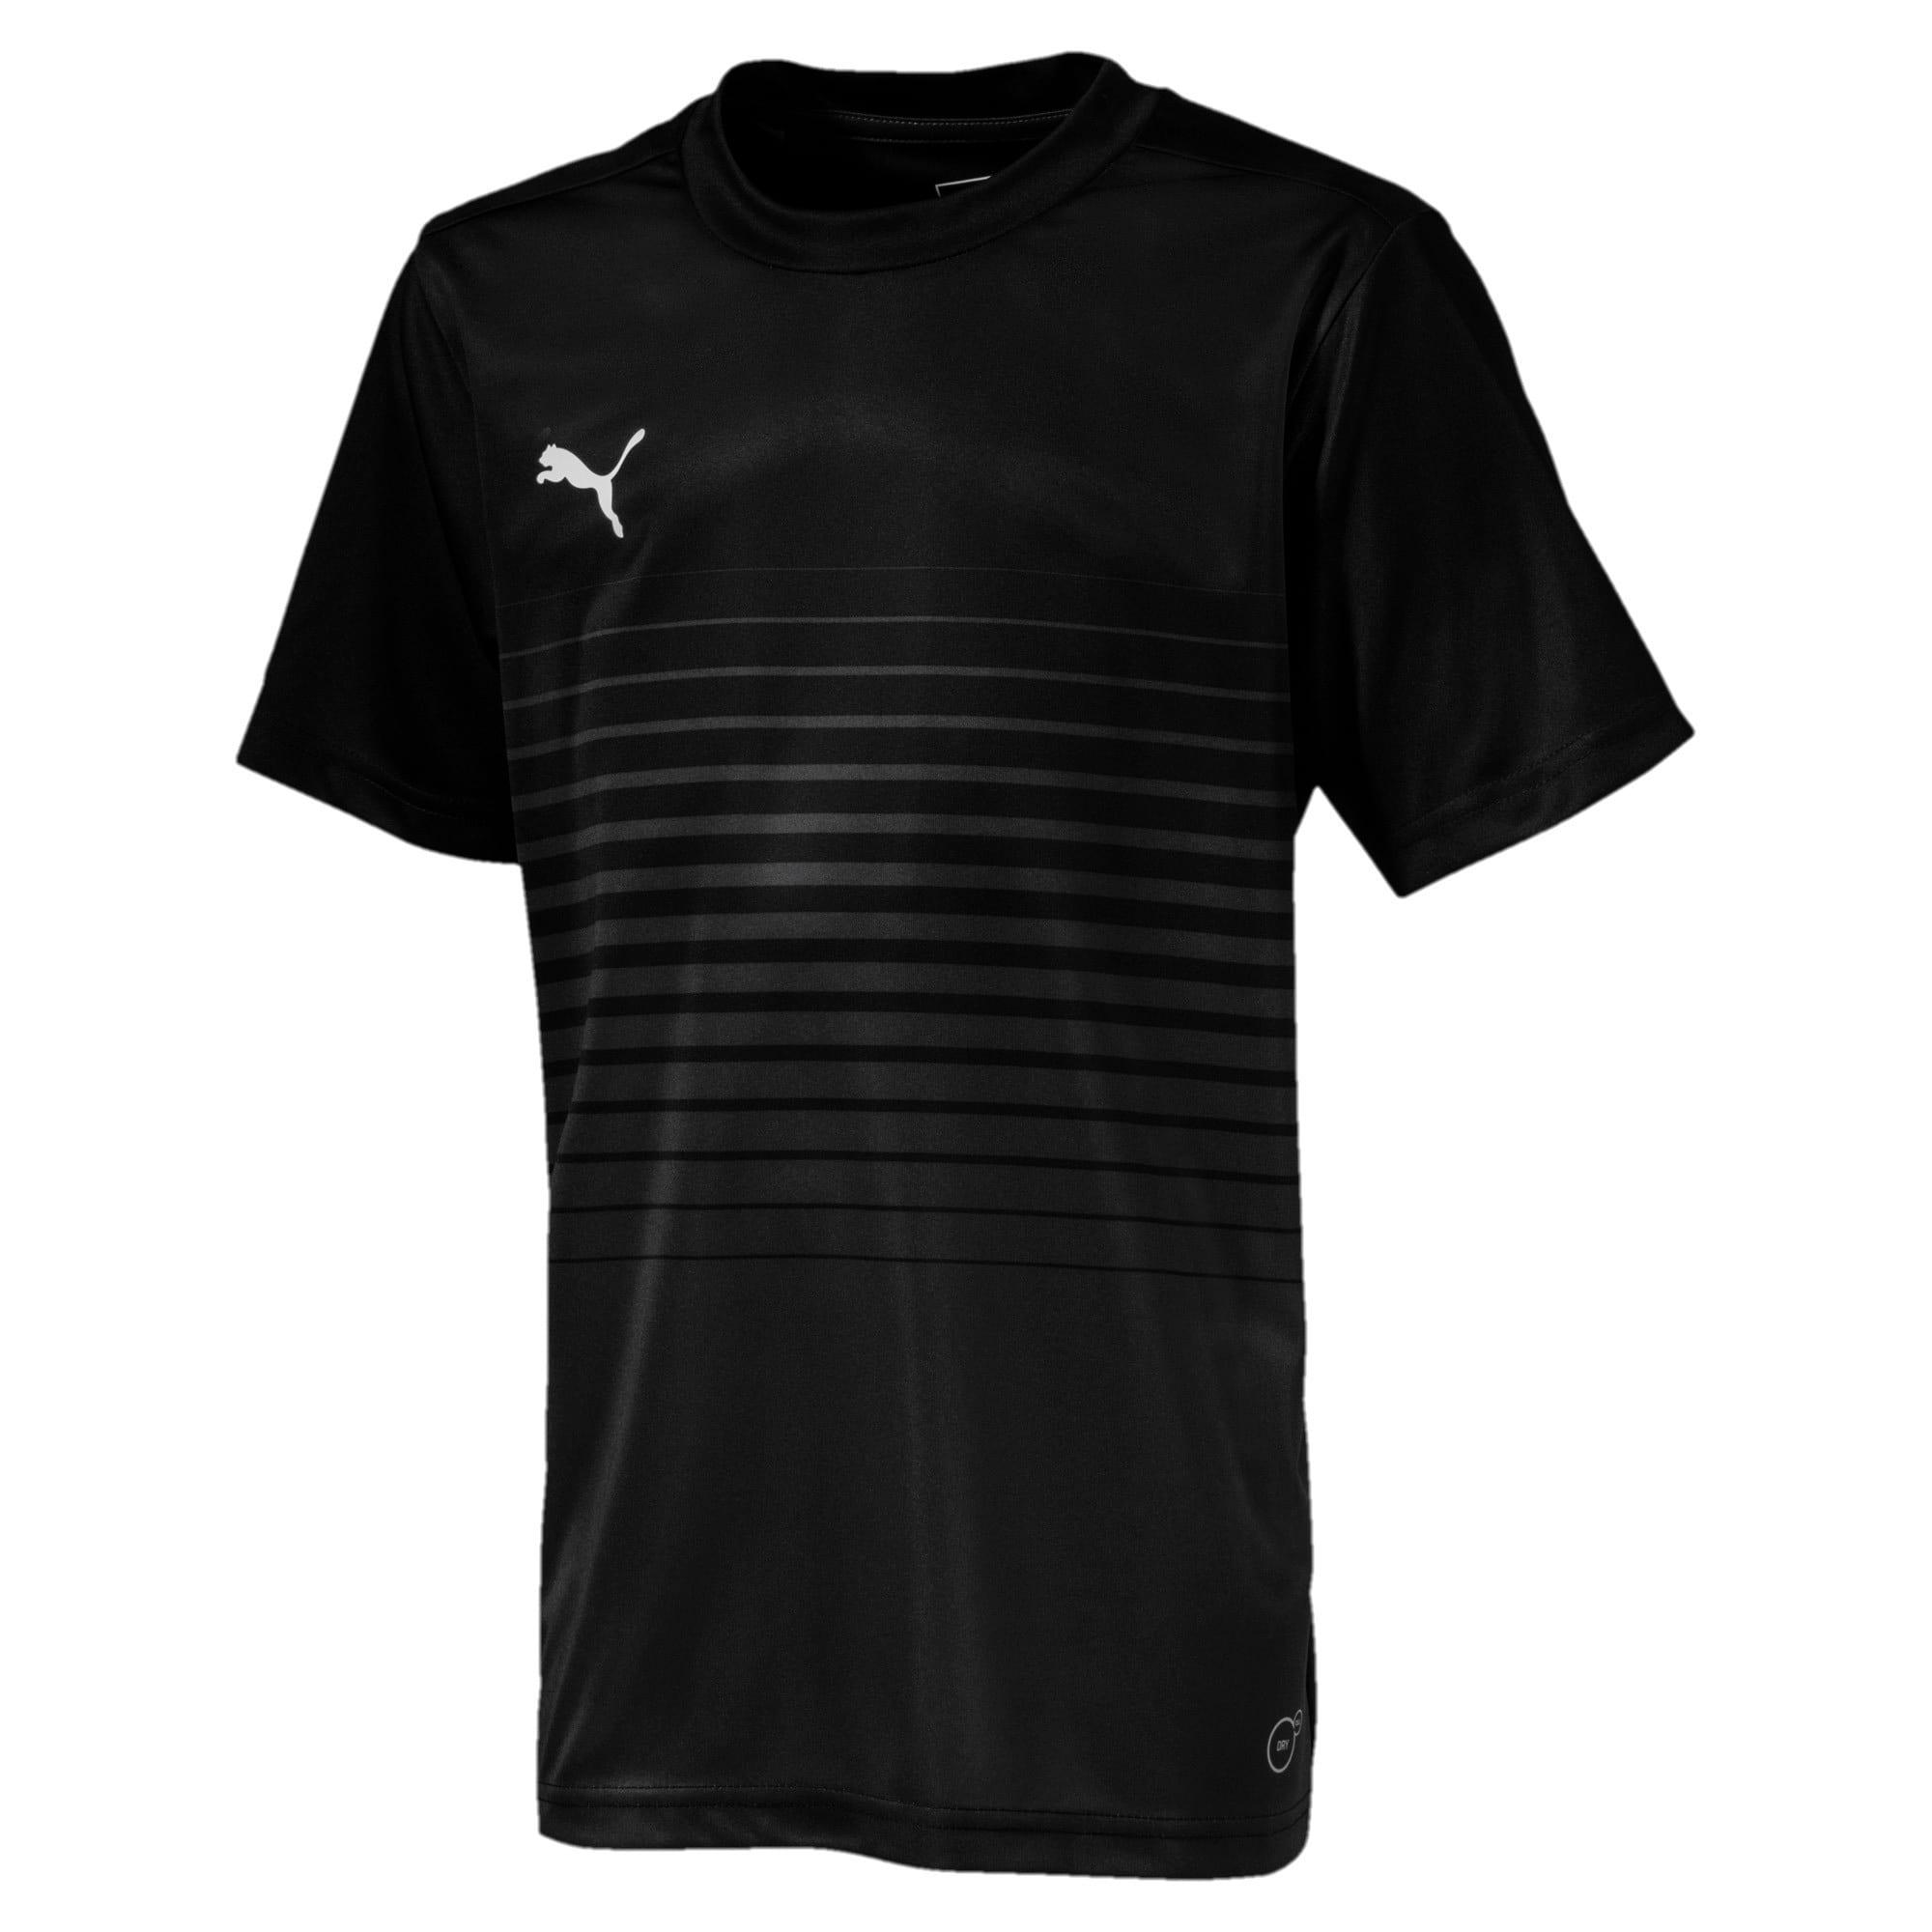 Thumbnail 1 of ftblPLAY Graphic Boys' Shirt, Asphalt-Puma Black, medium-IND